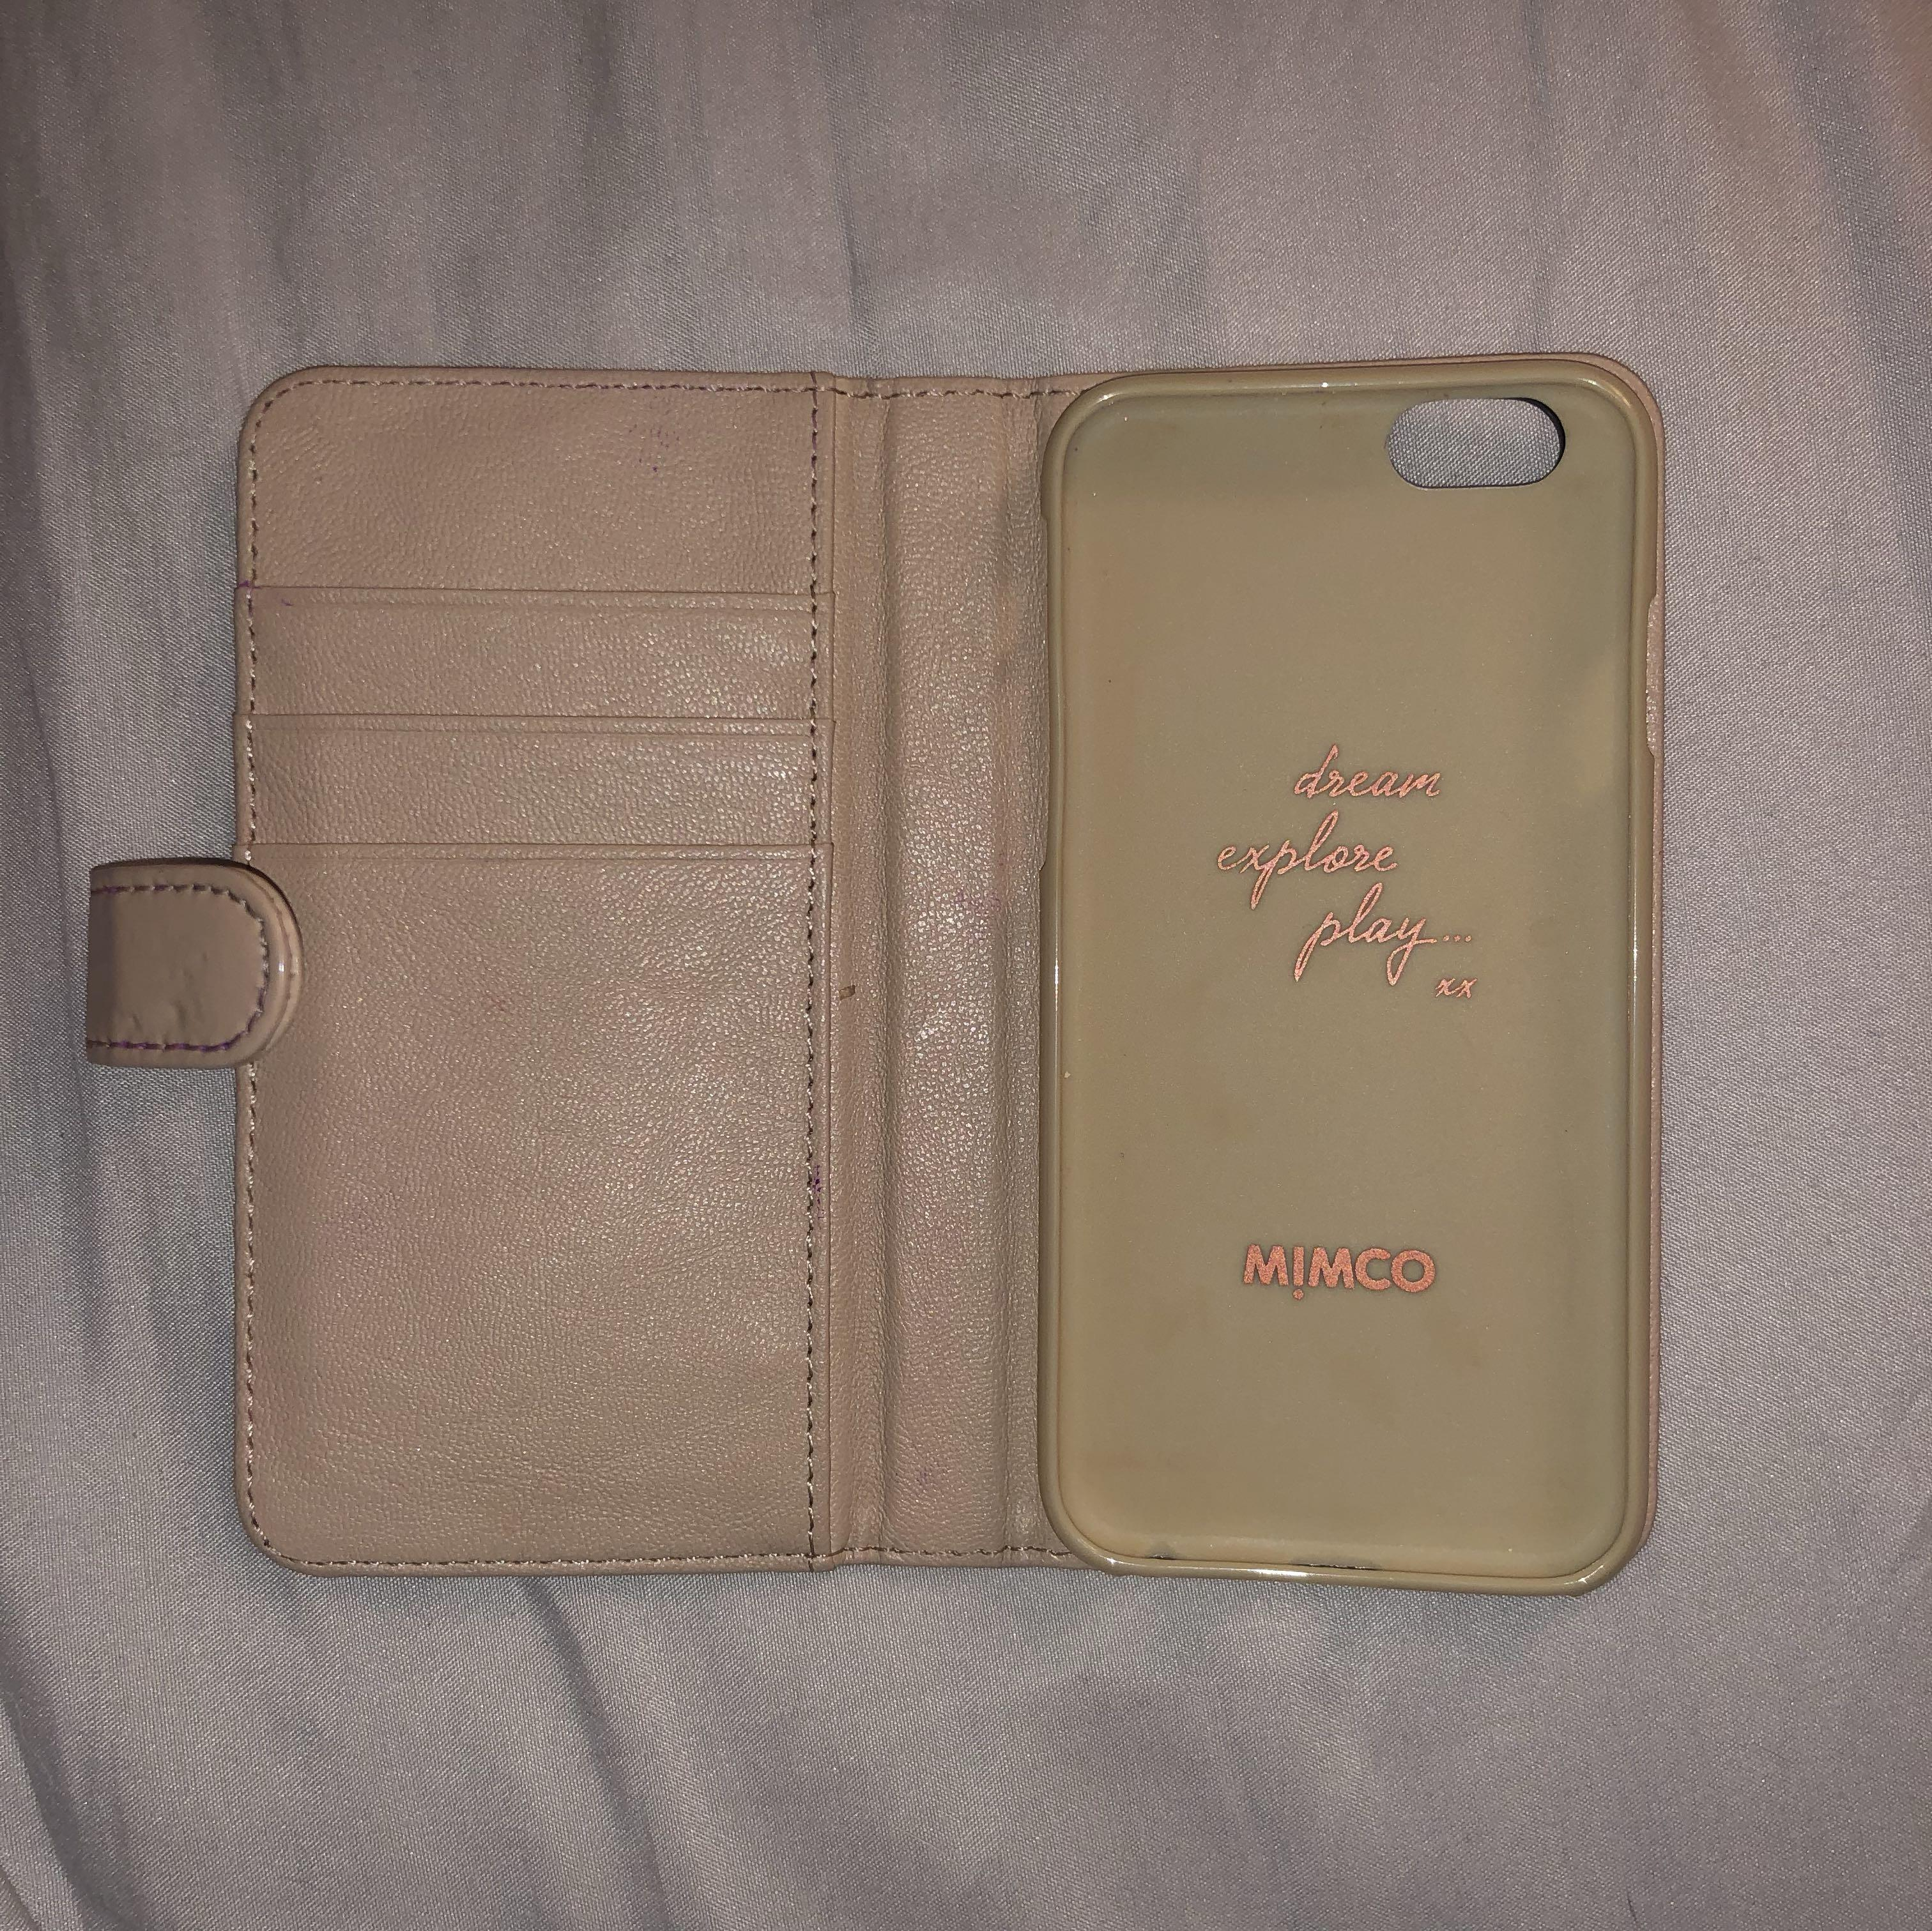 Mimco Phone Case IPhone 6/6s